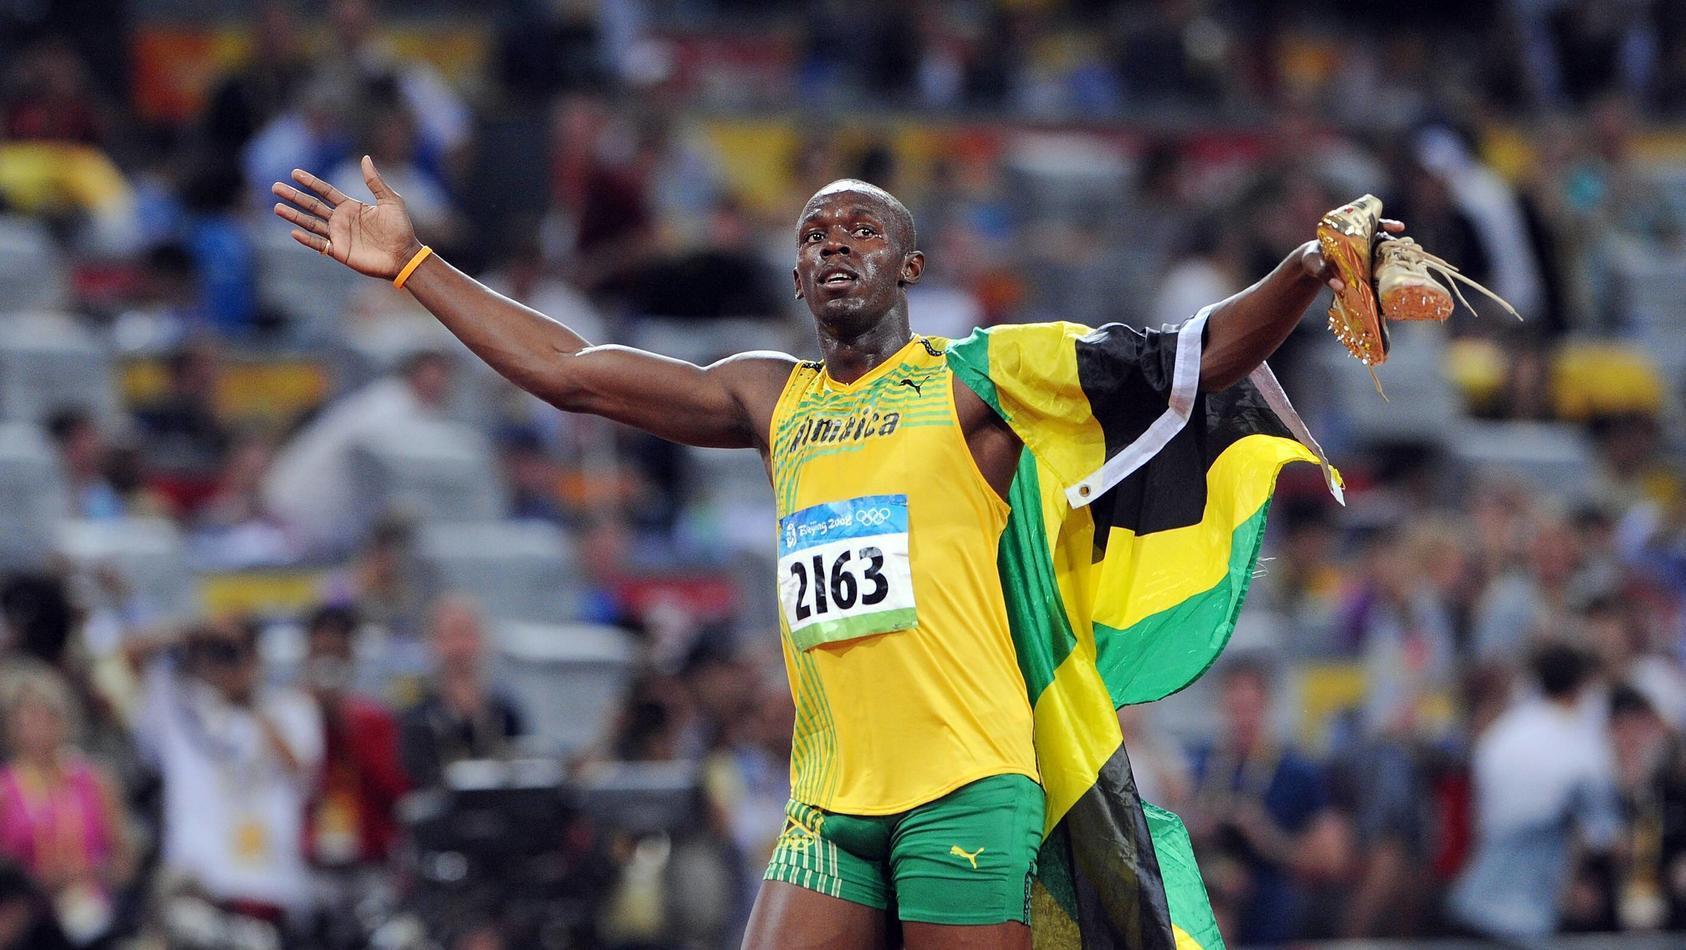 Usain Bolt (Jamaika) ist Olympiasieger über 100m - PUBLICATIONxNOTxINxSUIxAUTxNEDxITA